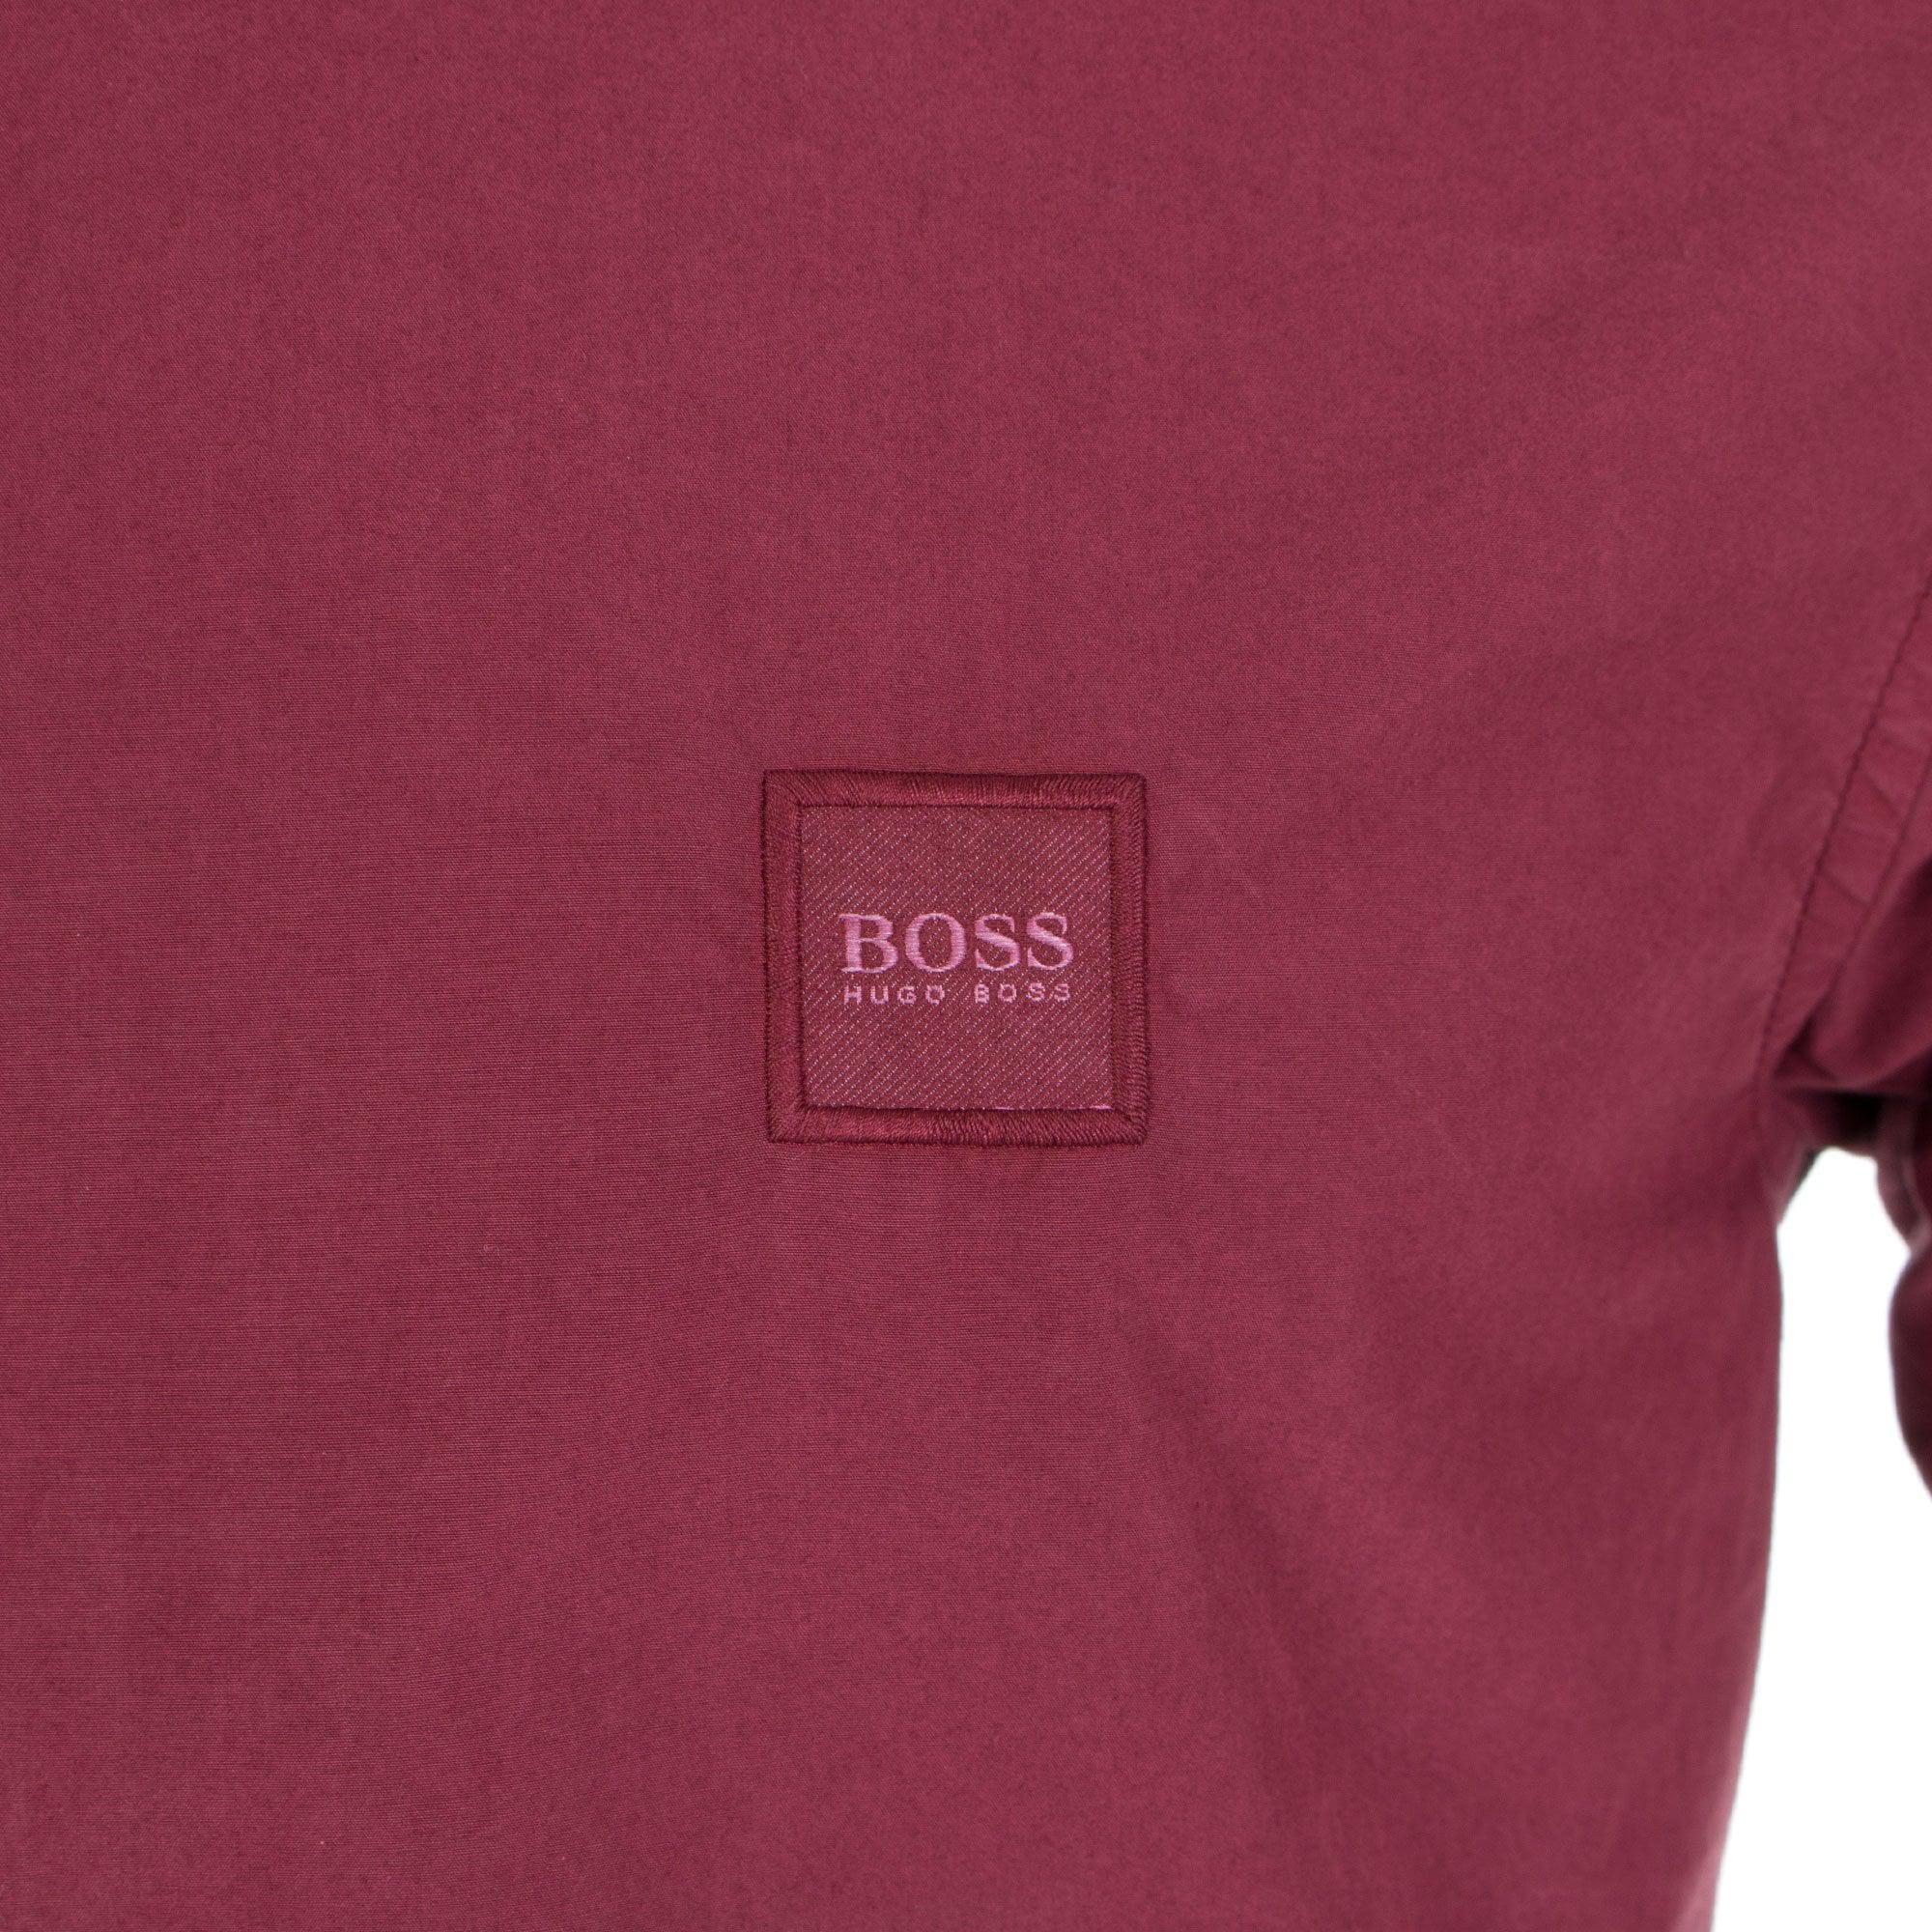 25588059d BOSS by Hugo Boss - Multicolor Casual Mypop Shirt for Men - Lyst. View  fullscreen